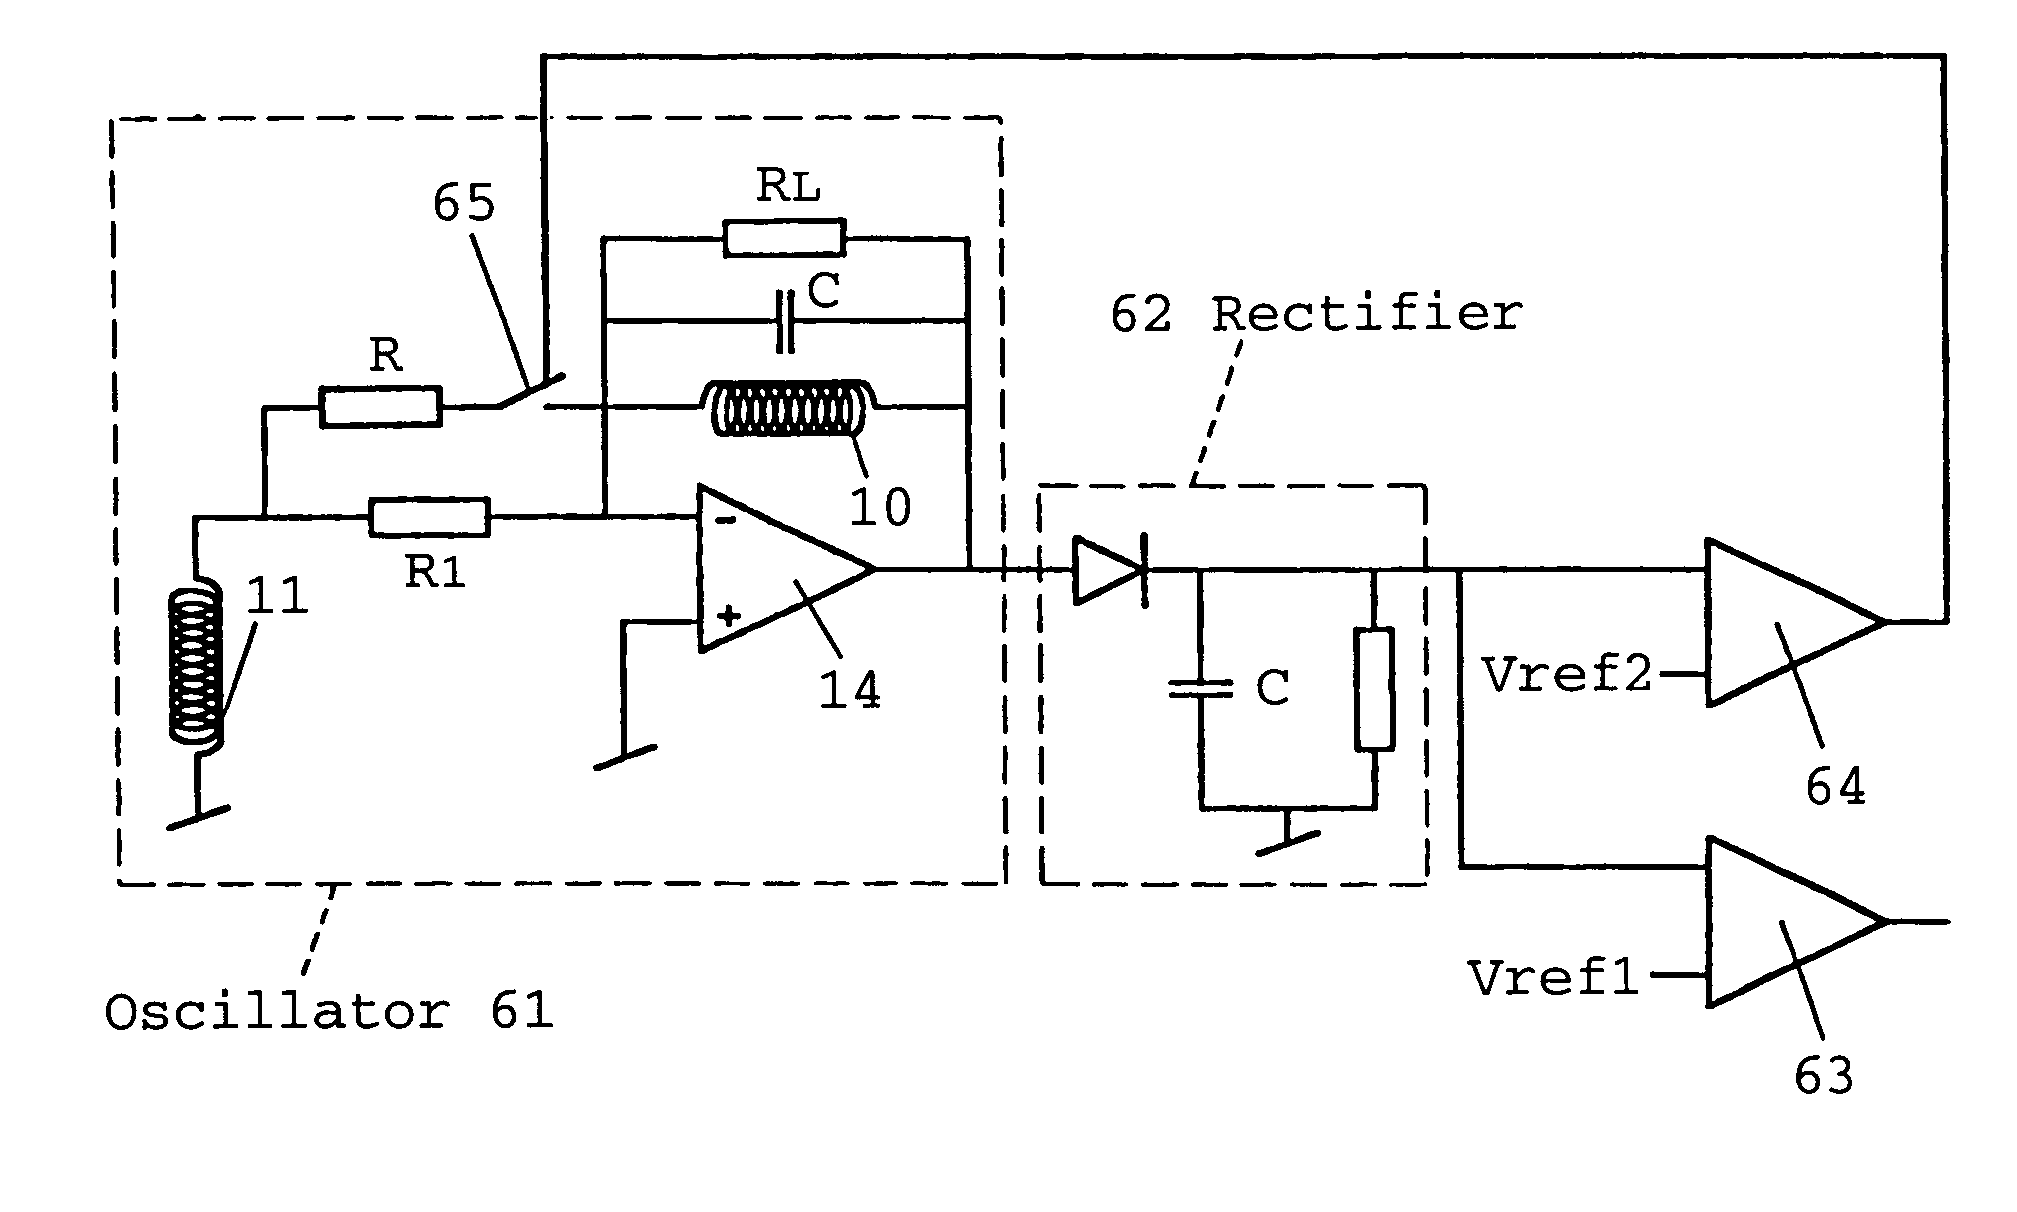 Proximity Sensor Diagram Great Design Of Wiring Motor Prestolite Winch Mbj6302 Ifm 35 Circuit Symbol